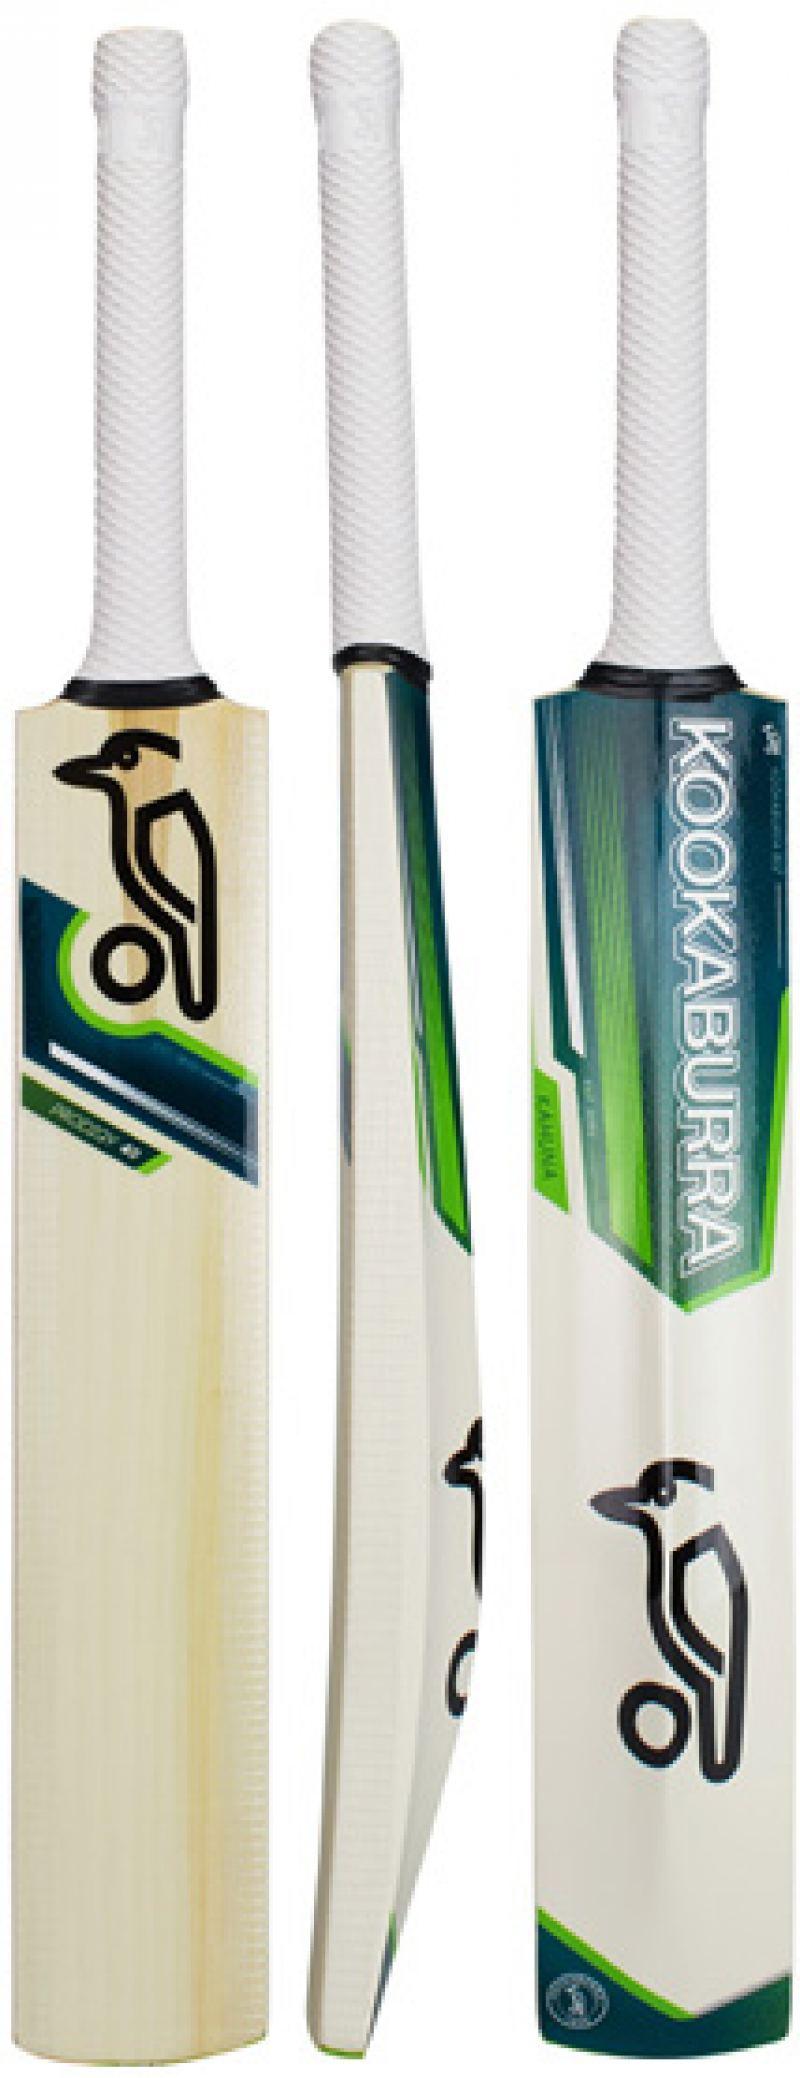 Kookaburra Kahuna Prodigy 40 Junior Cricket Bat (Kashmir Willow)